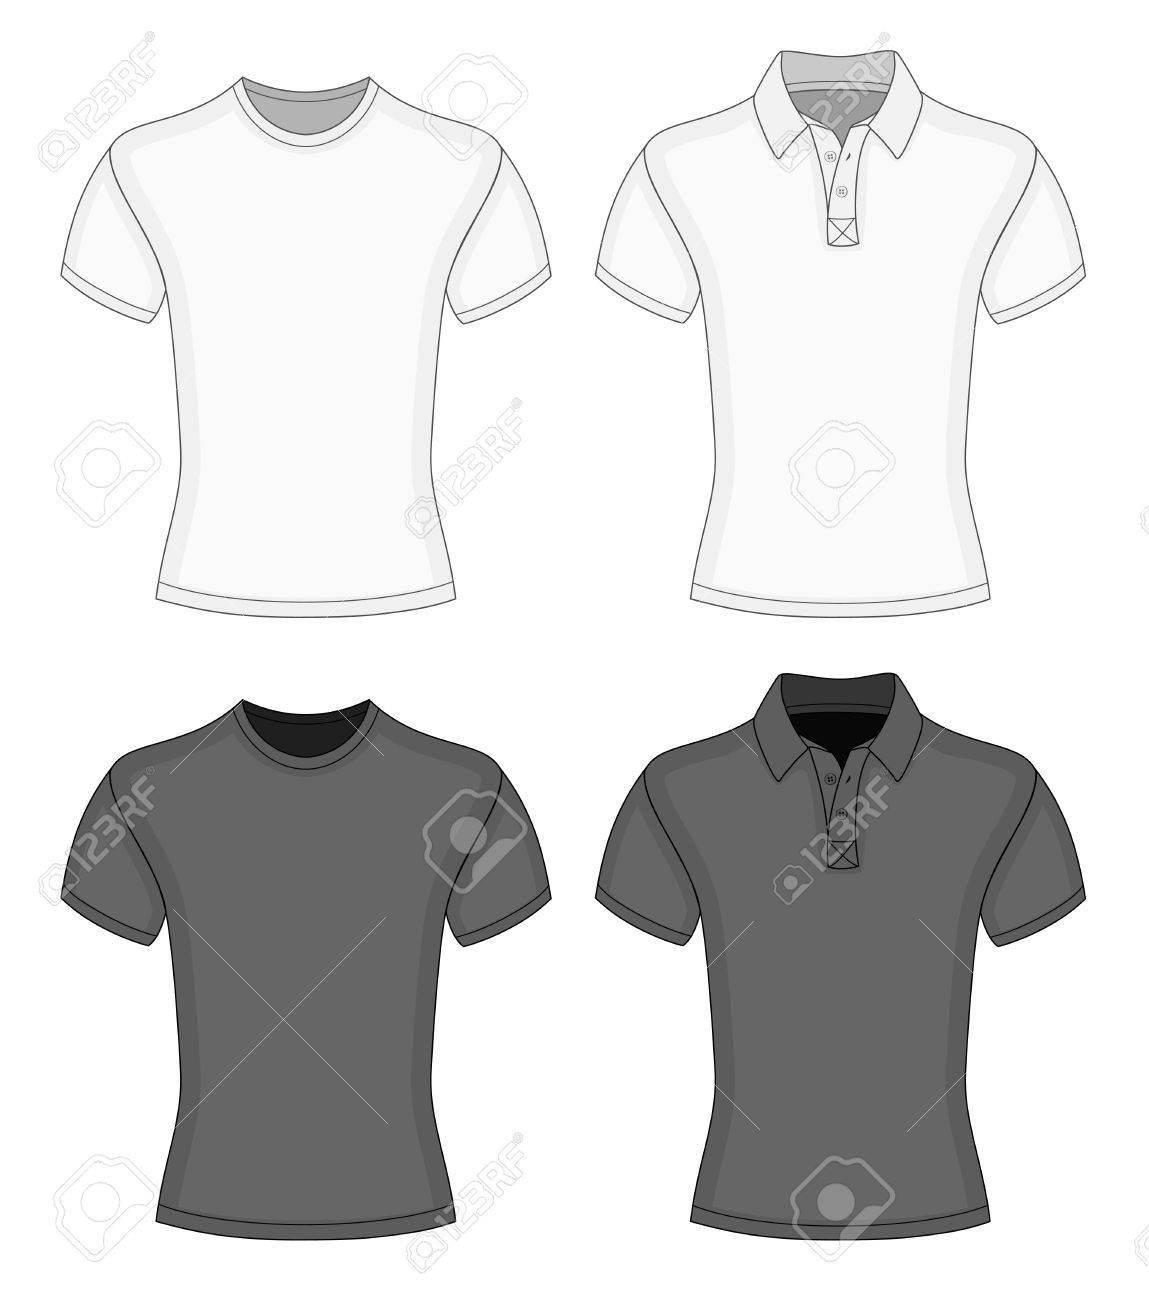 Shirt design black - Men S White And Black Short Sleeve T Shirt And Polo Shirt Design Templates Stock